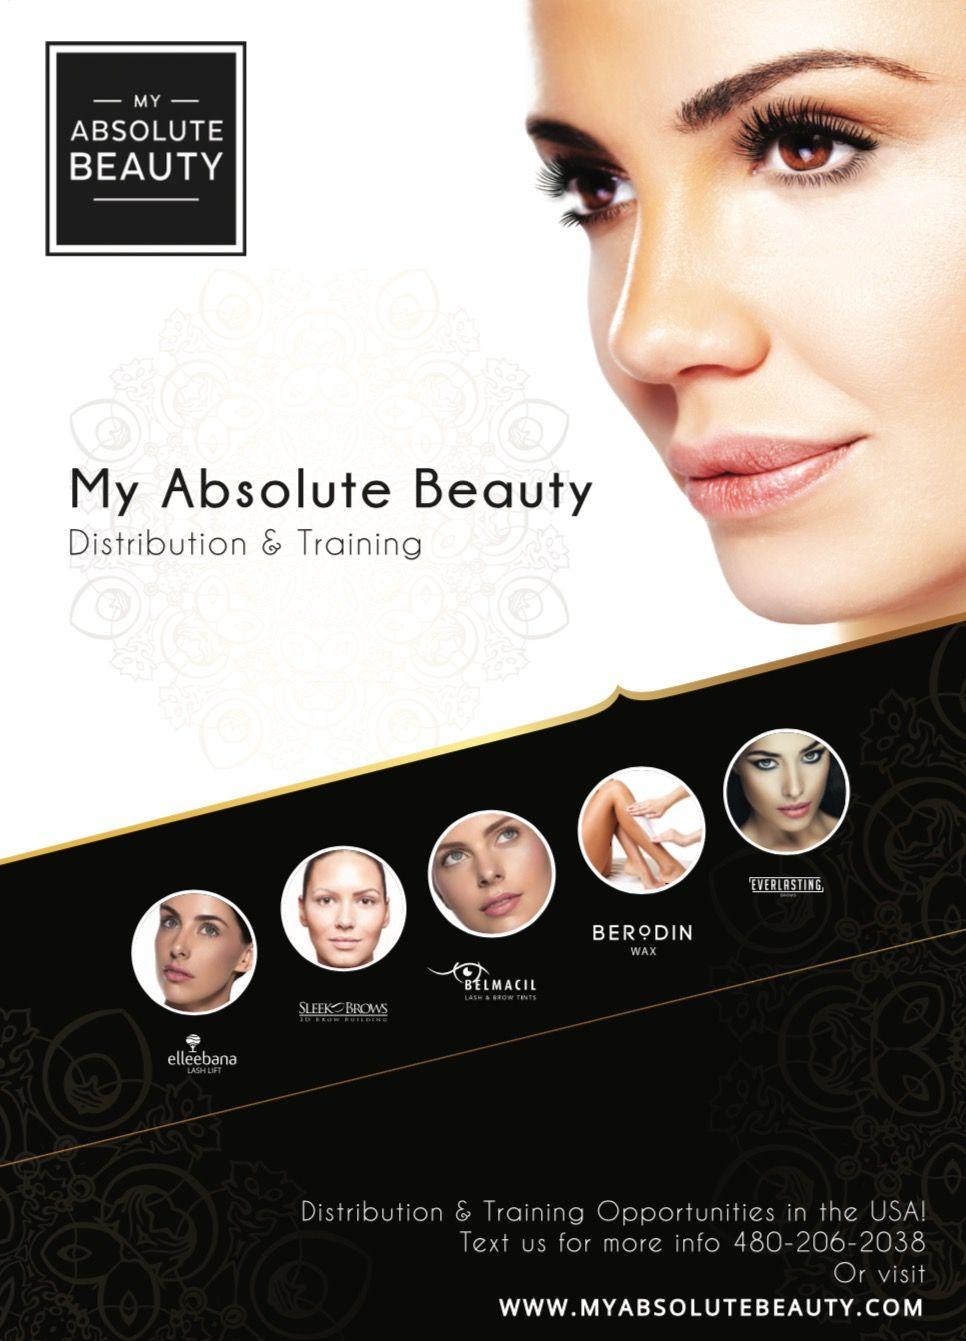 27245d816b3 Pin by My Absolute Beauty on ELLEEBANA - ONE SHOT LASH LIFT | Elleebana  lash lift, Lash lift, Lashes